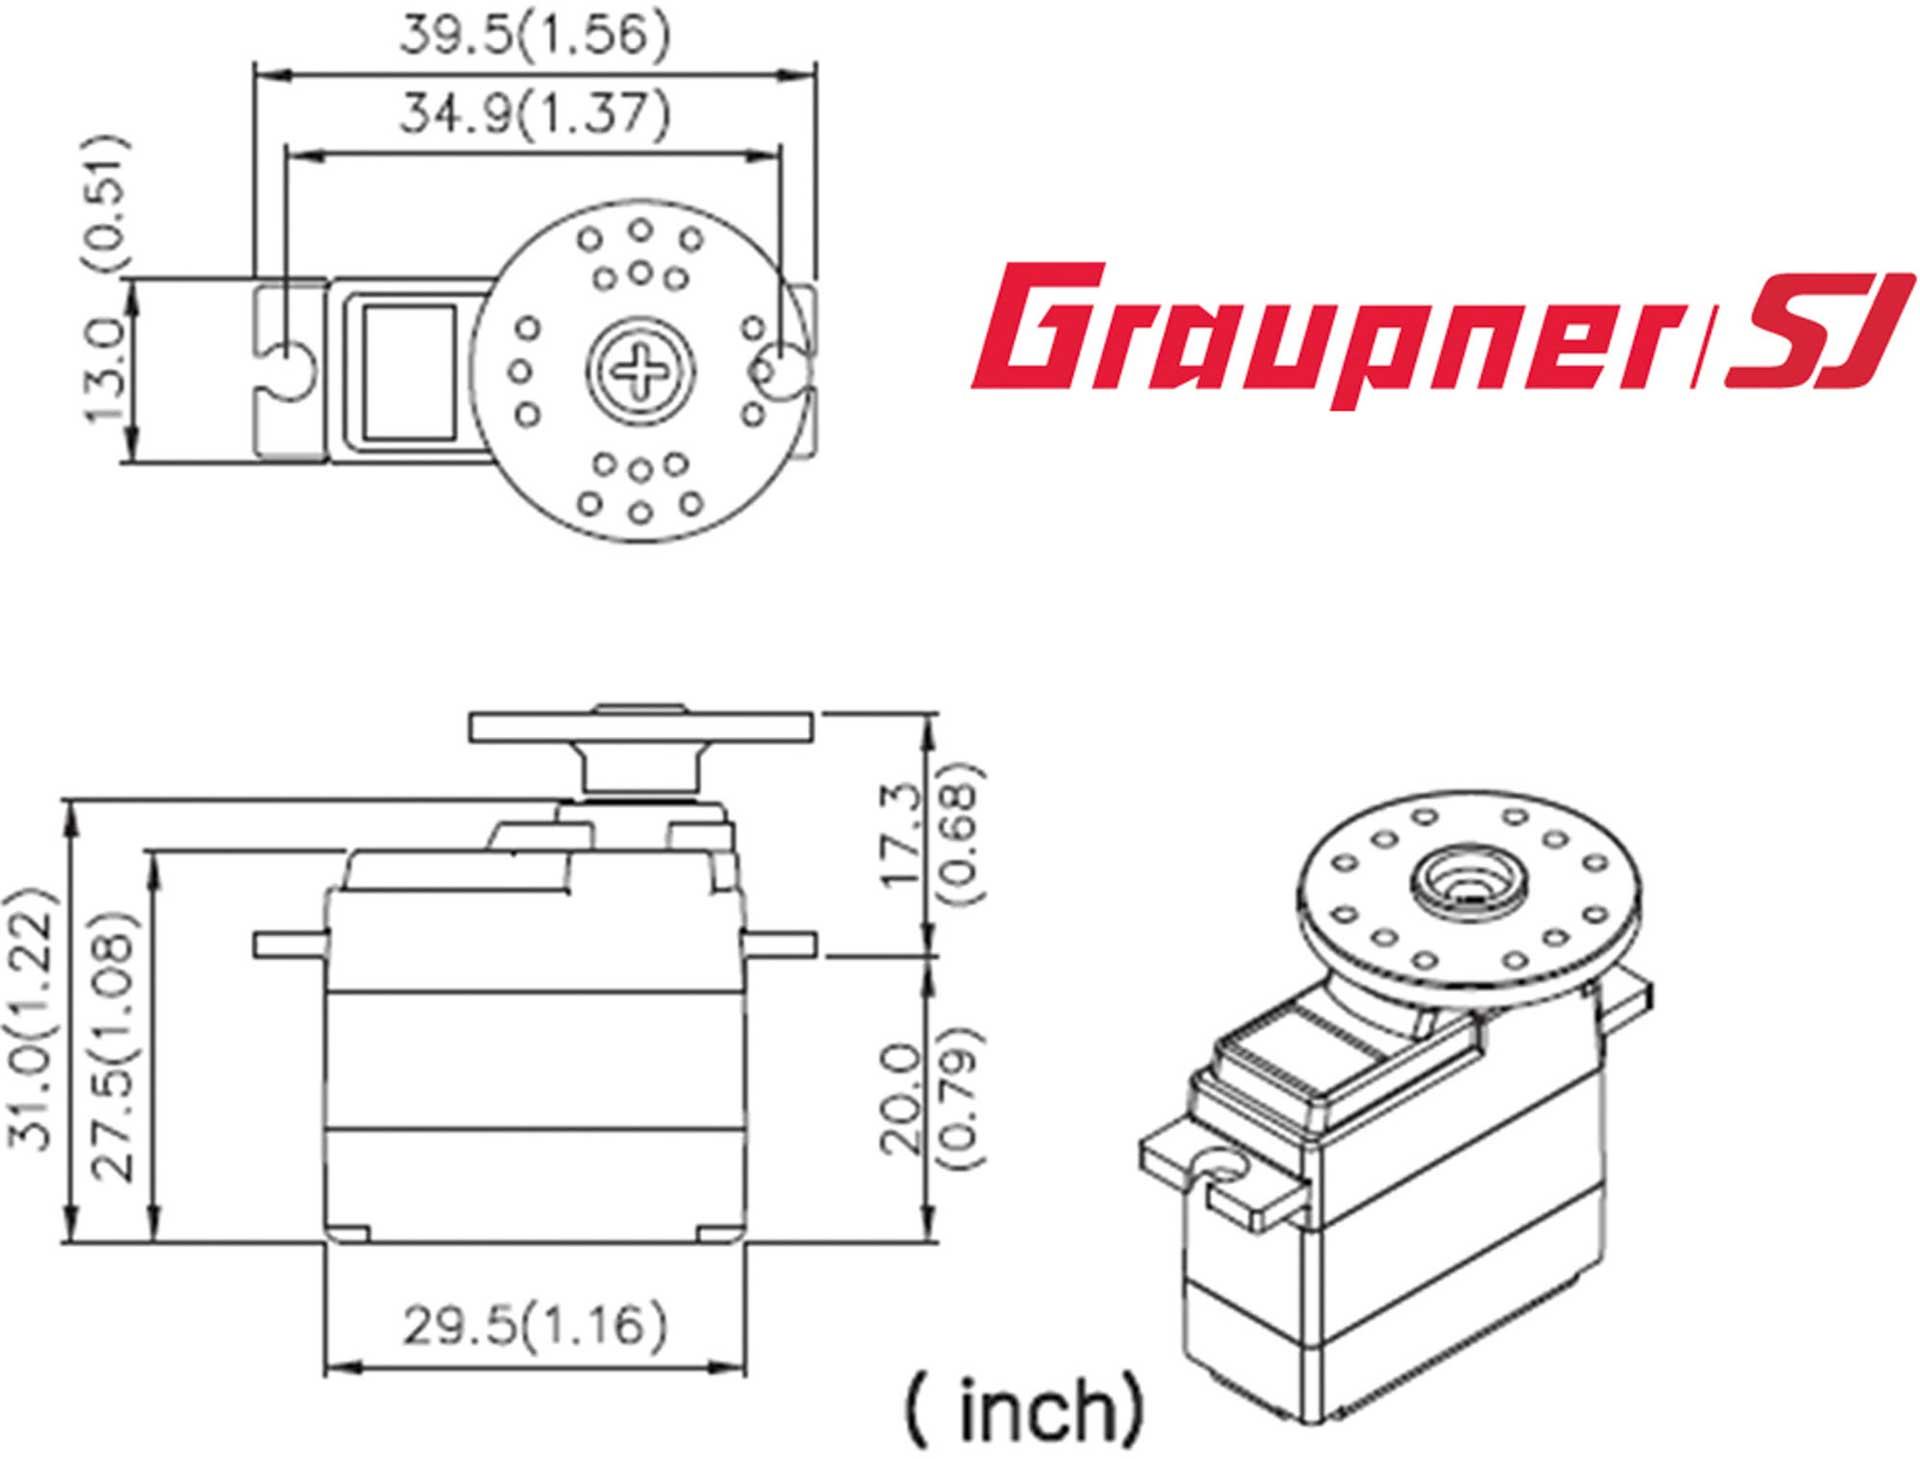 GRAUPNER DES 586 BB DIGITAL SERVO